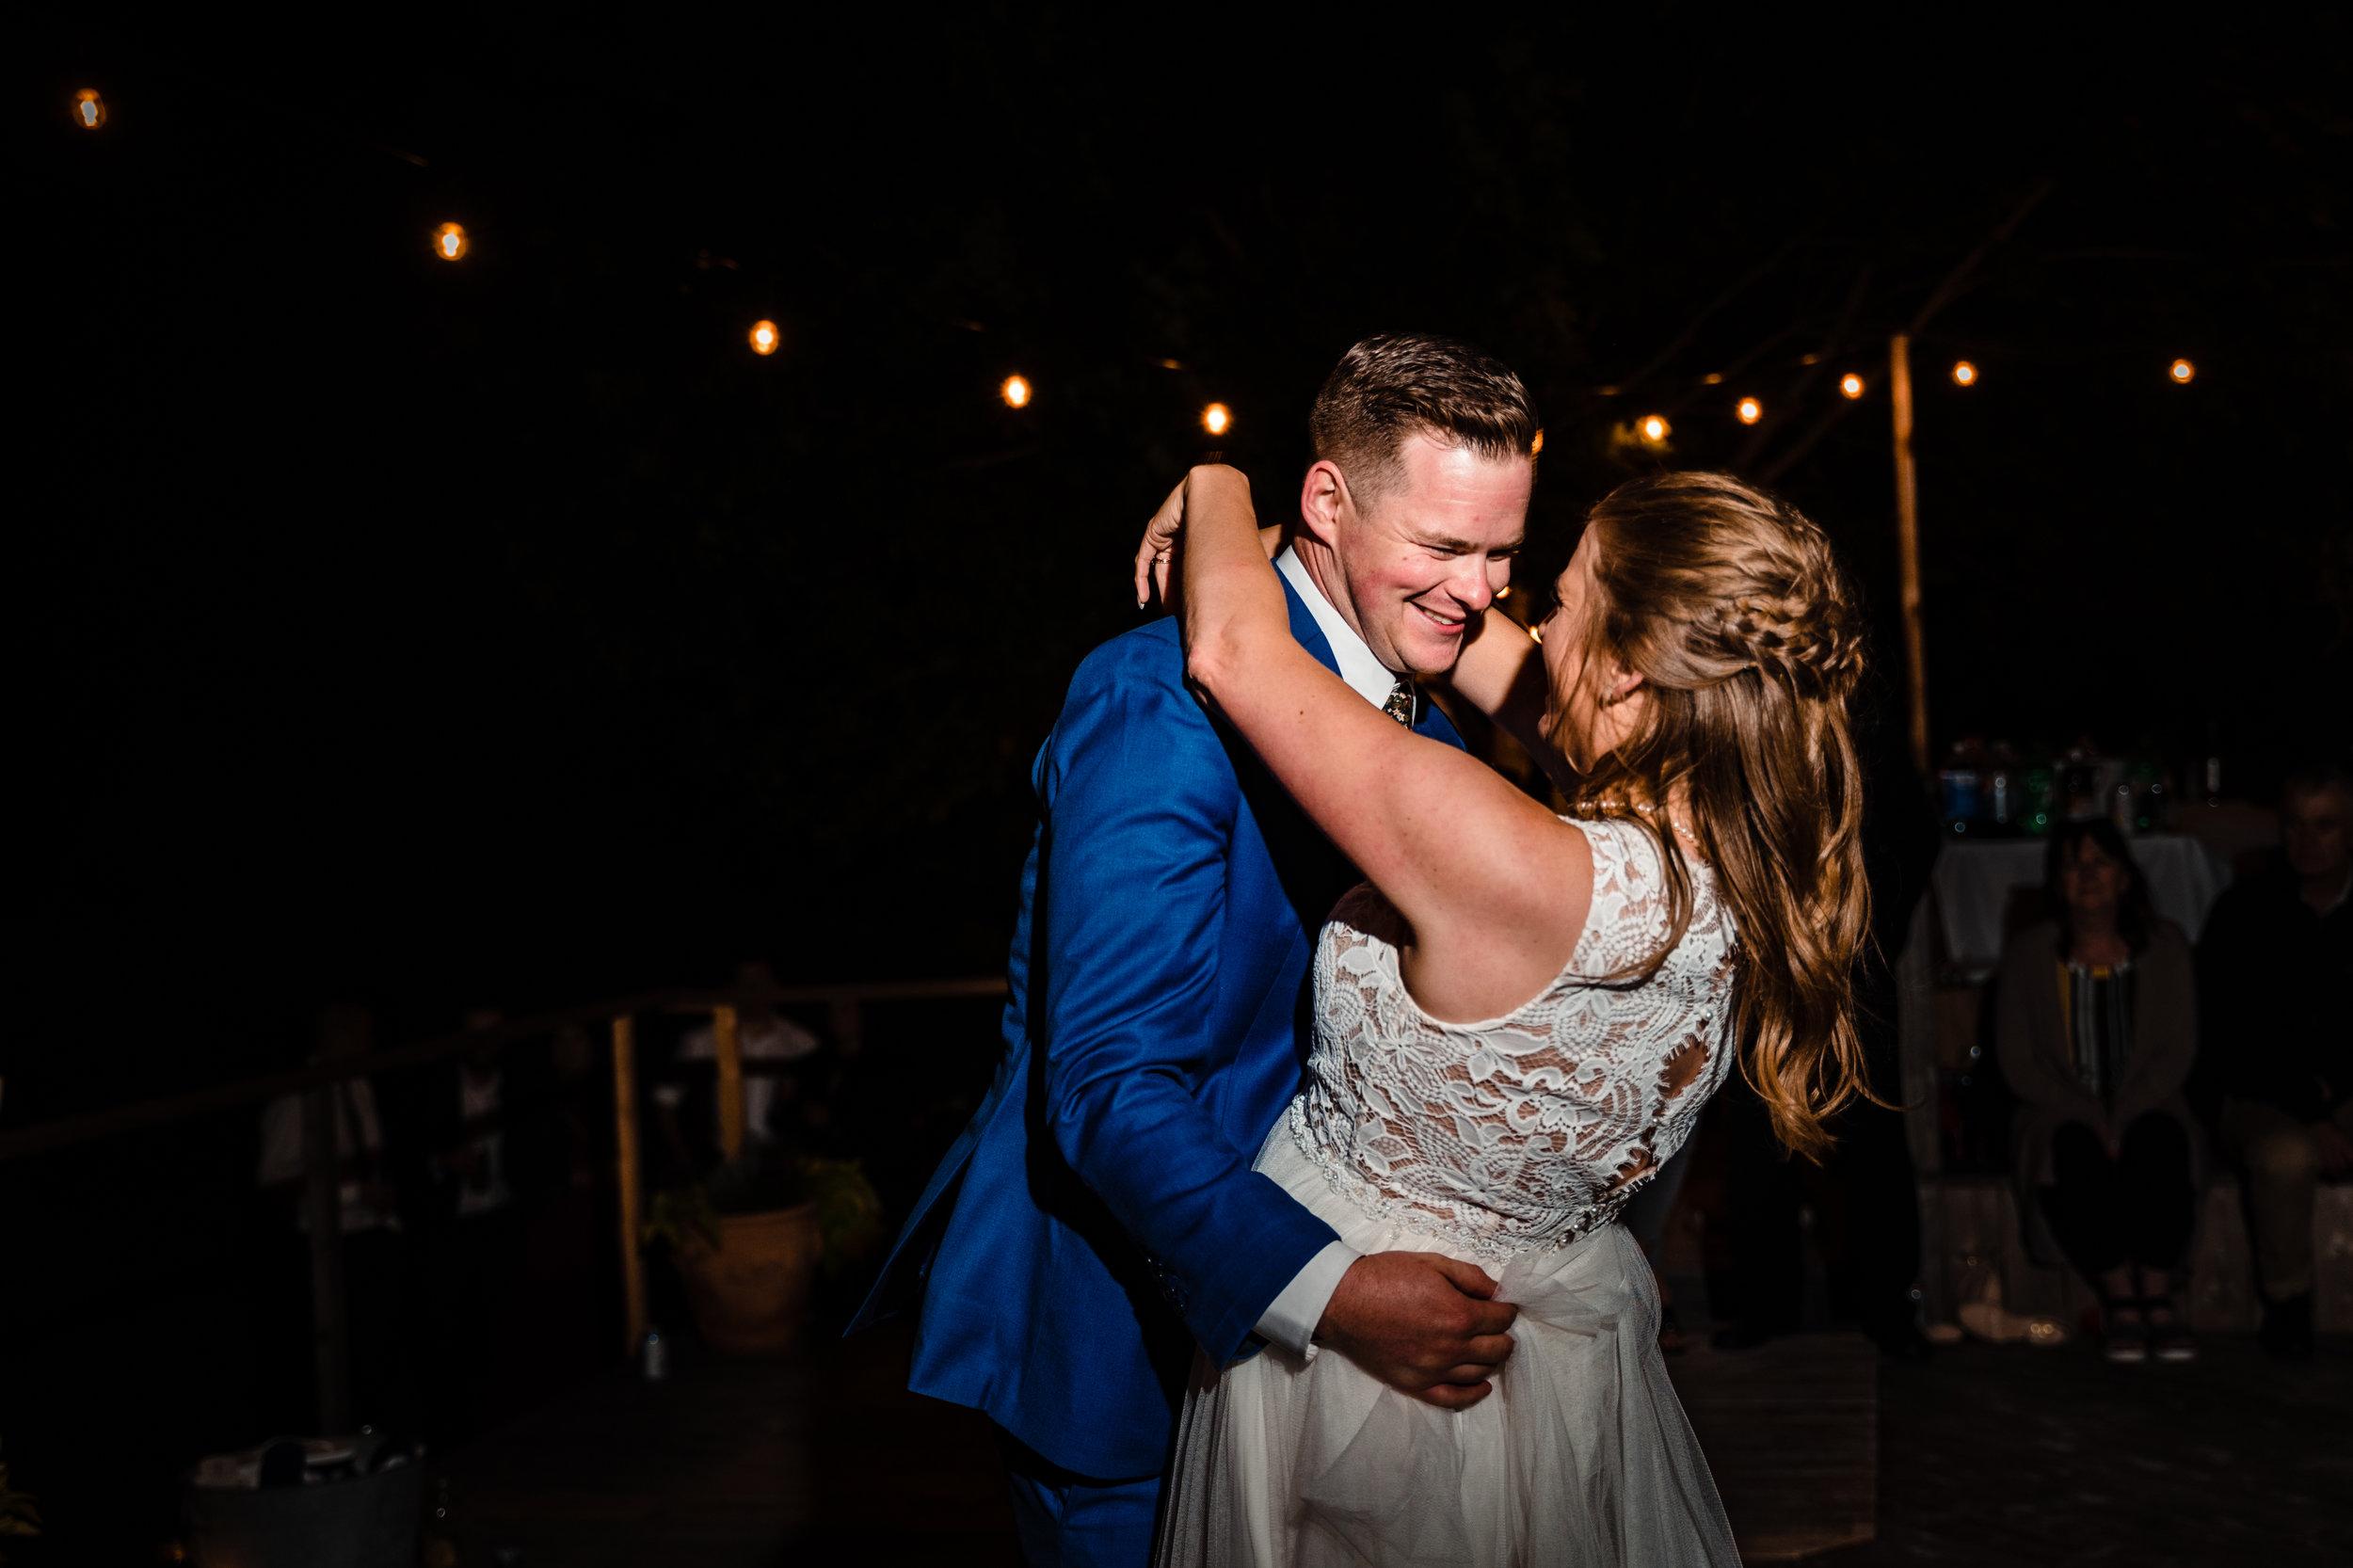 Janelle-Mitch-Halifax-Wedding-Nova-Scotia-Photography (151 of 163).jpg